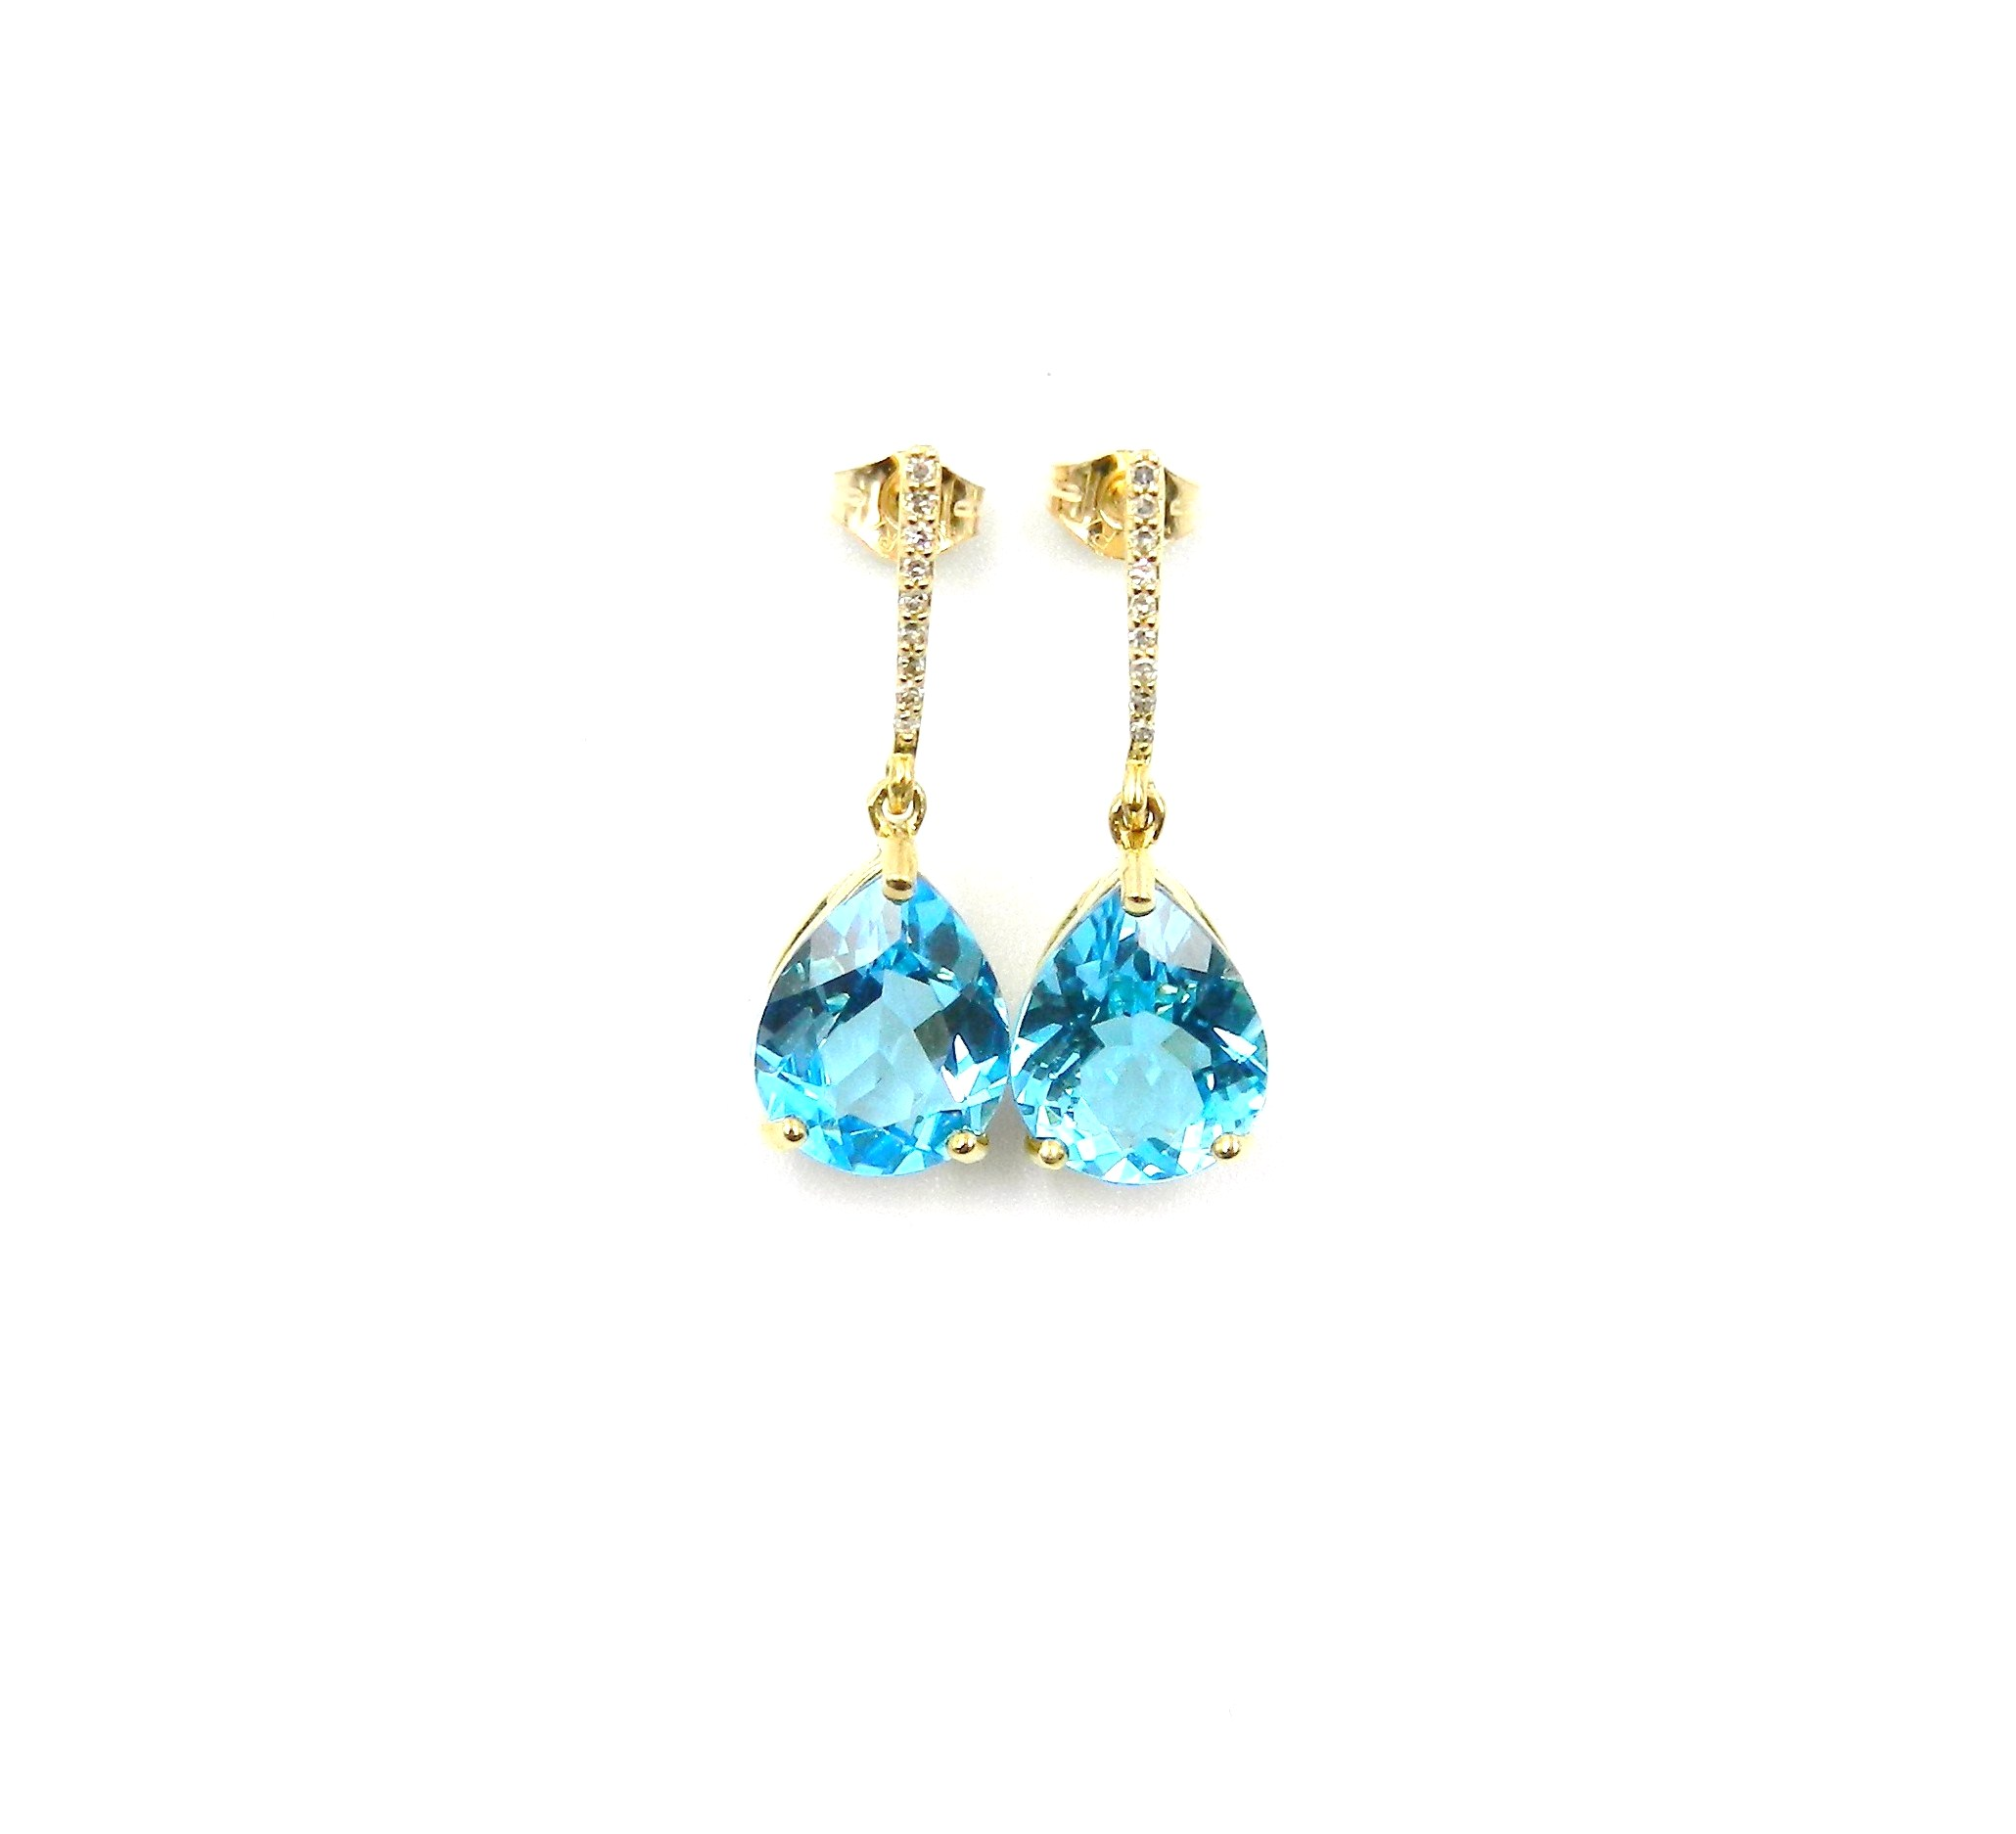 10 Karat Yellow Gold Blue Topaz and Diamond Earrings